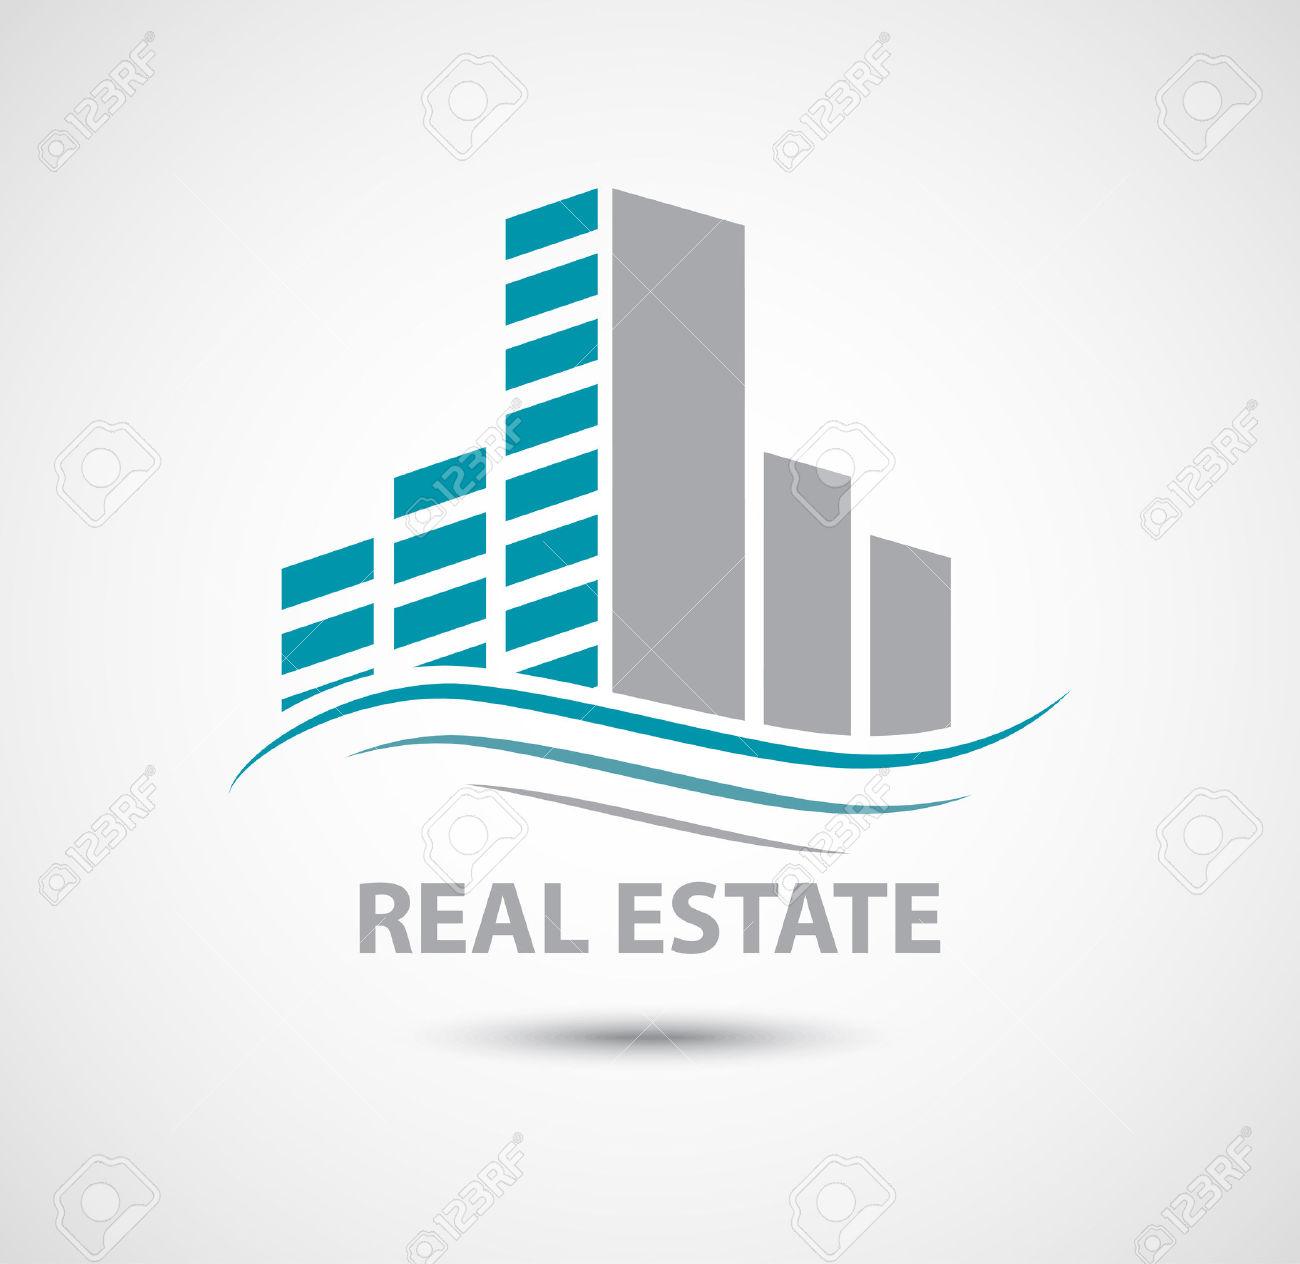 Building logo clipart image download Real Estate, Logo, Building, Icon, Hotel, Symbol, Vector, Element ... image download